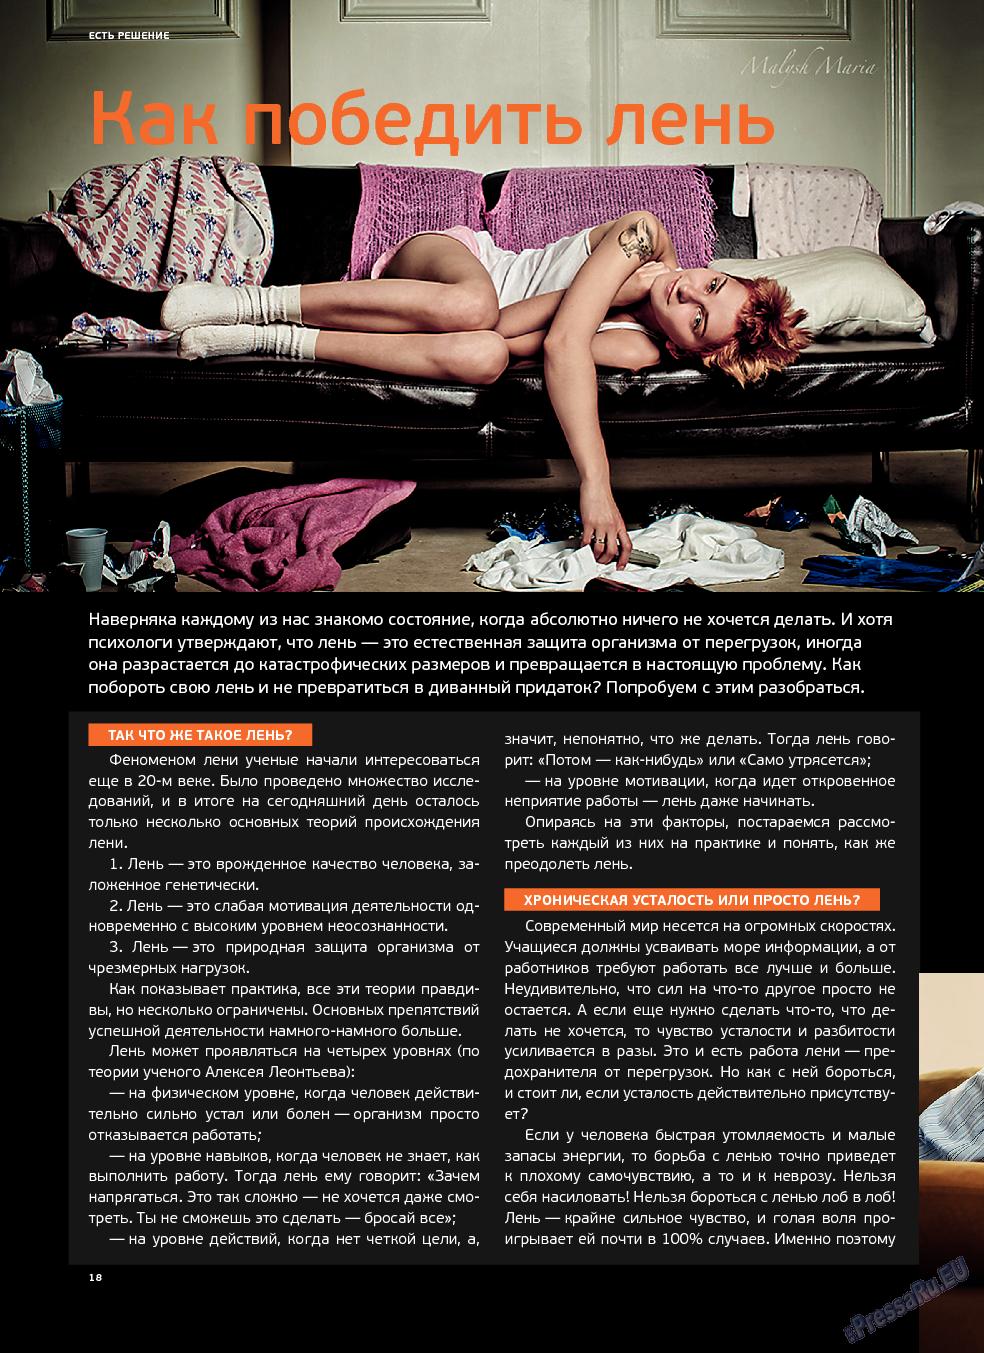 Артек (журнал). 2013 год, номер 2, стр. 20